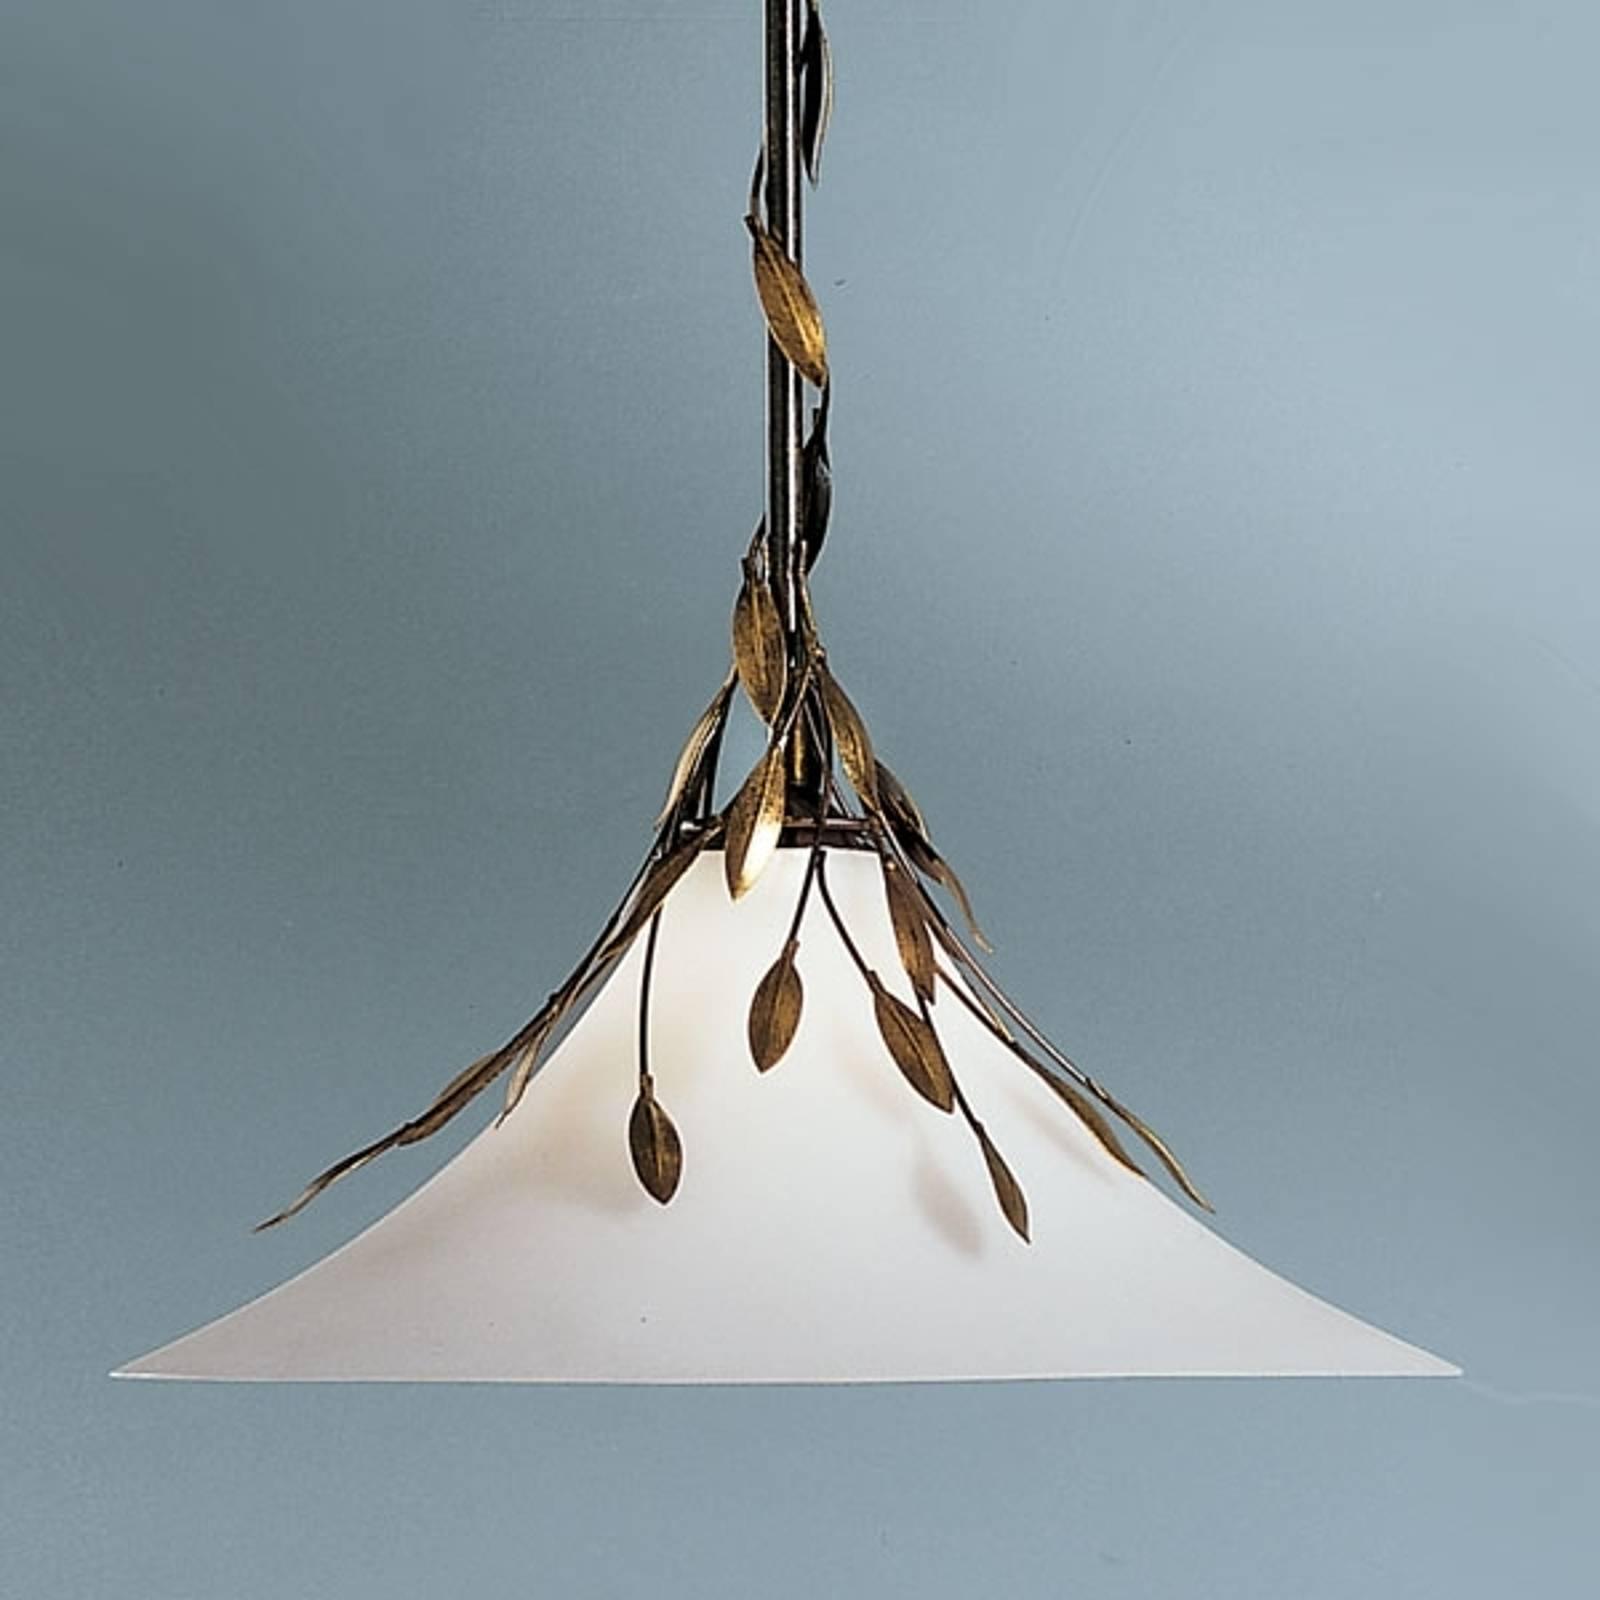 Suspension CAMPANA décorative diamètre 47 cm